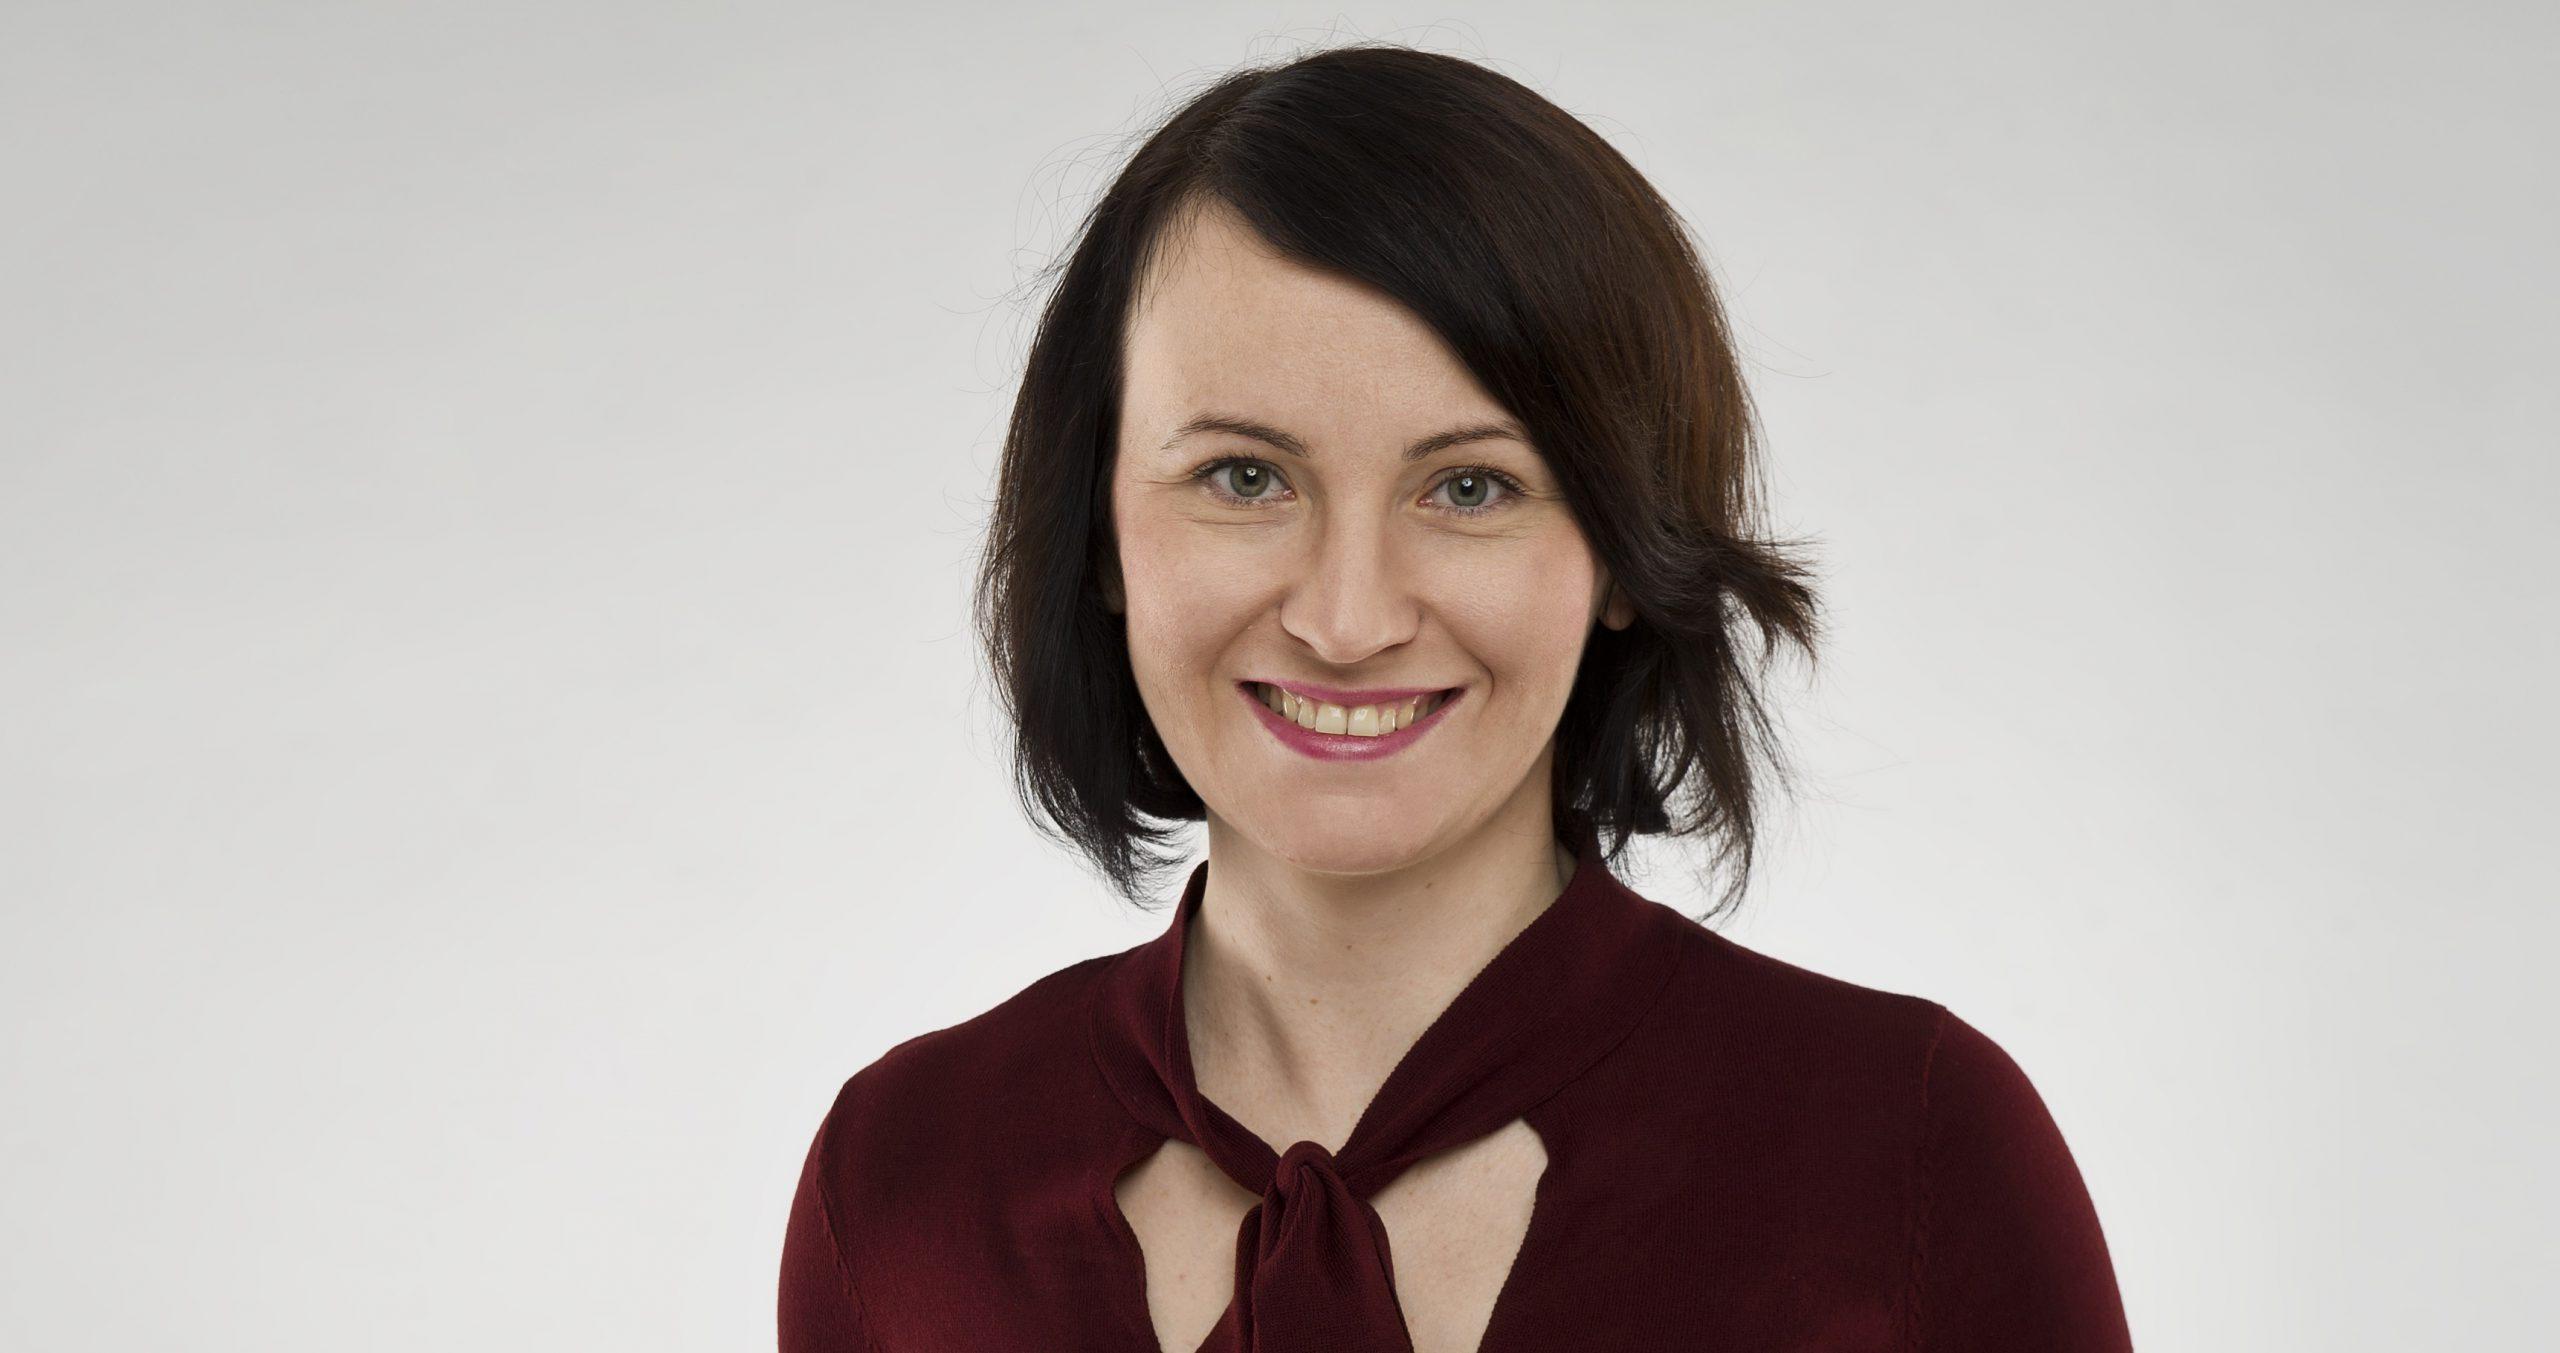 Joanna Mostył, Senior Category Manager Arla Foods